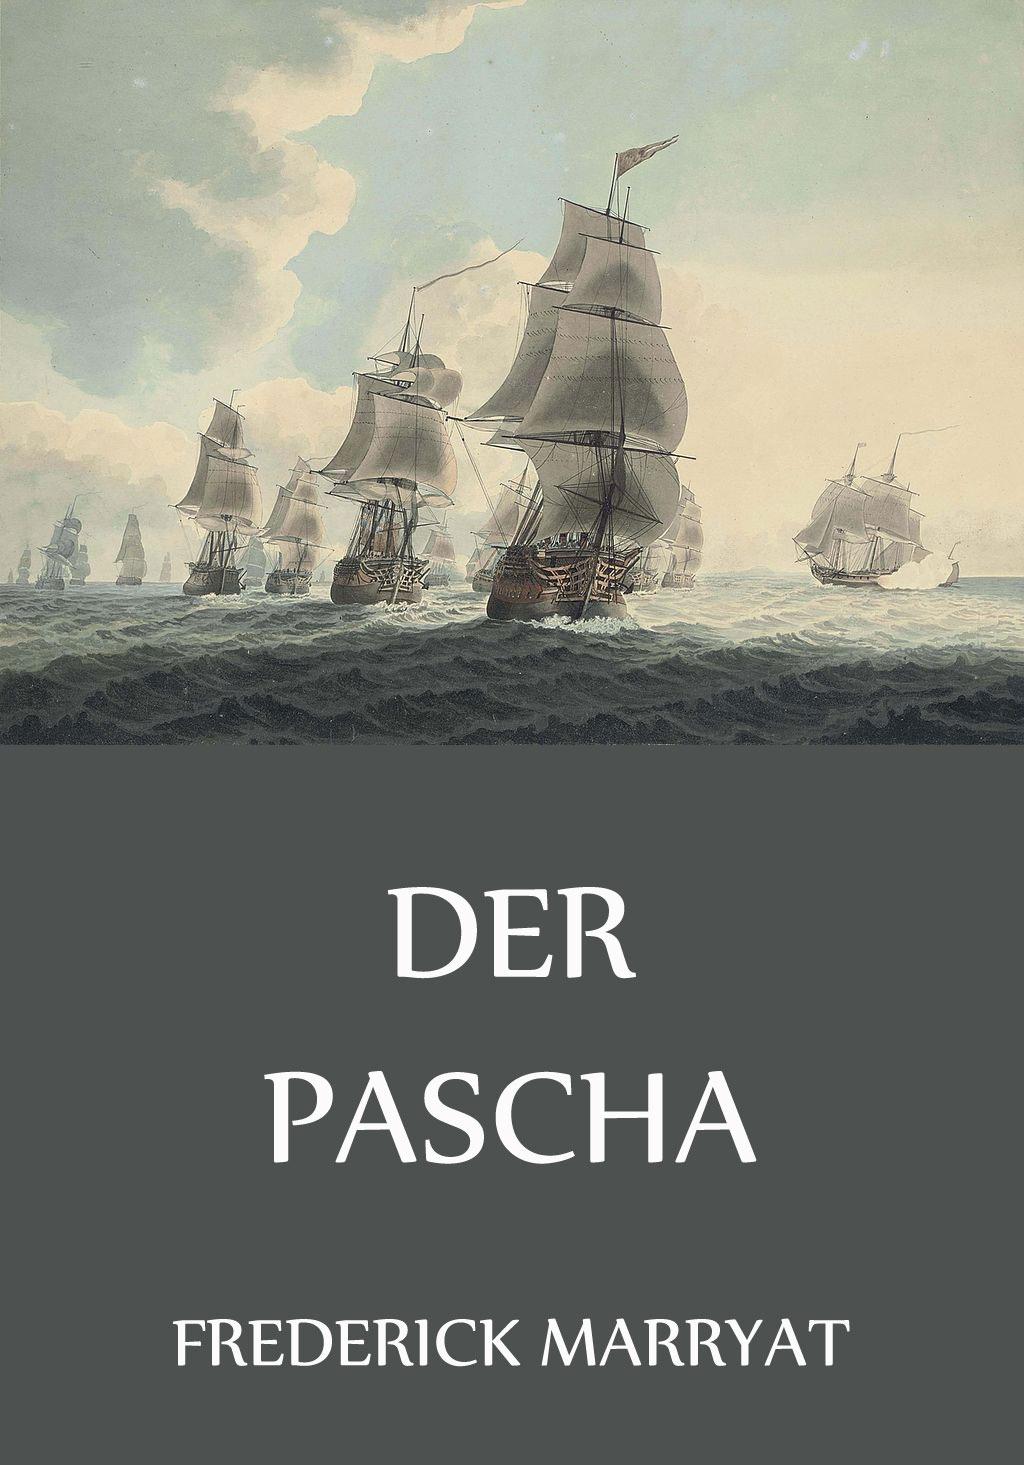 Frederick Marryat Der Pascha